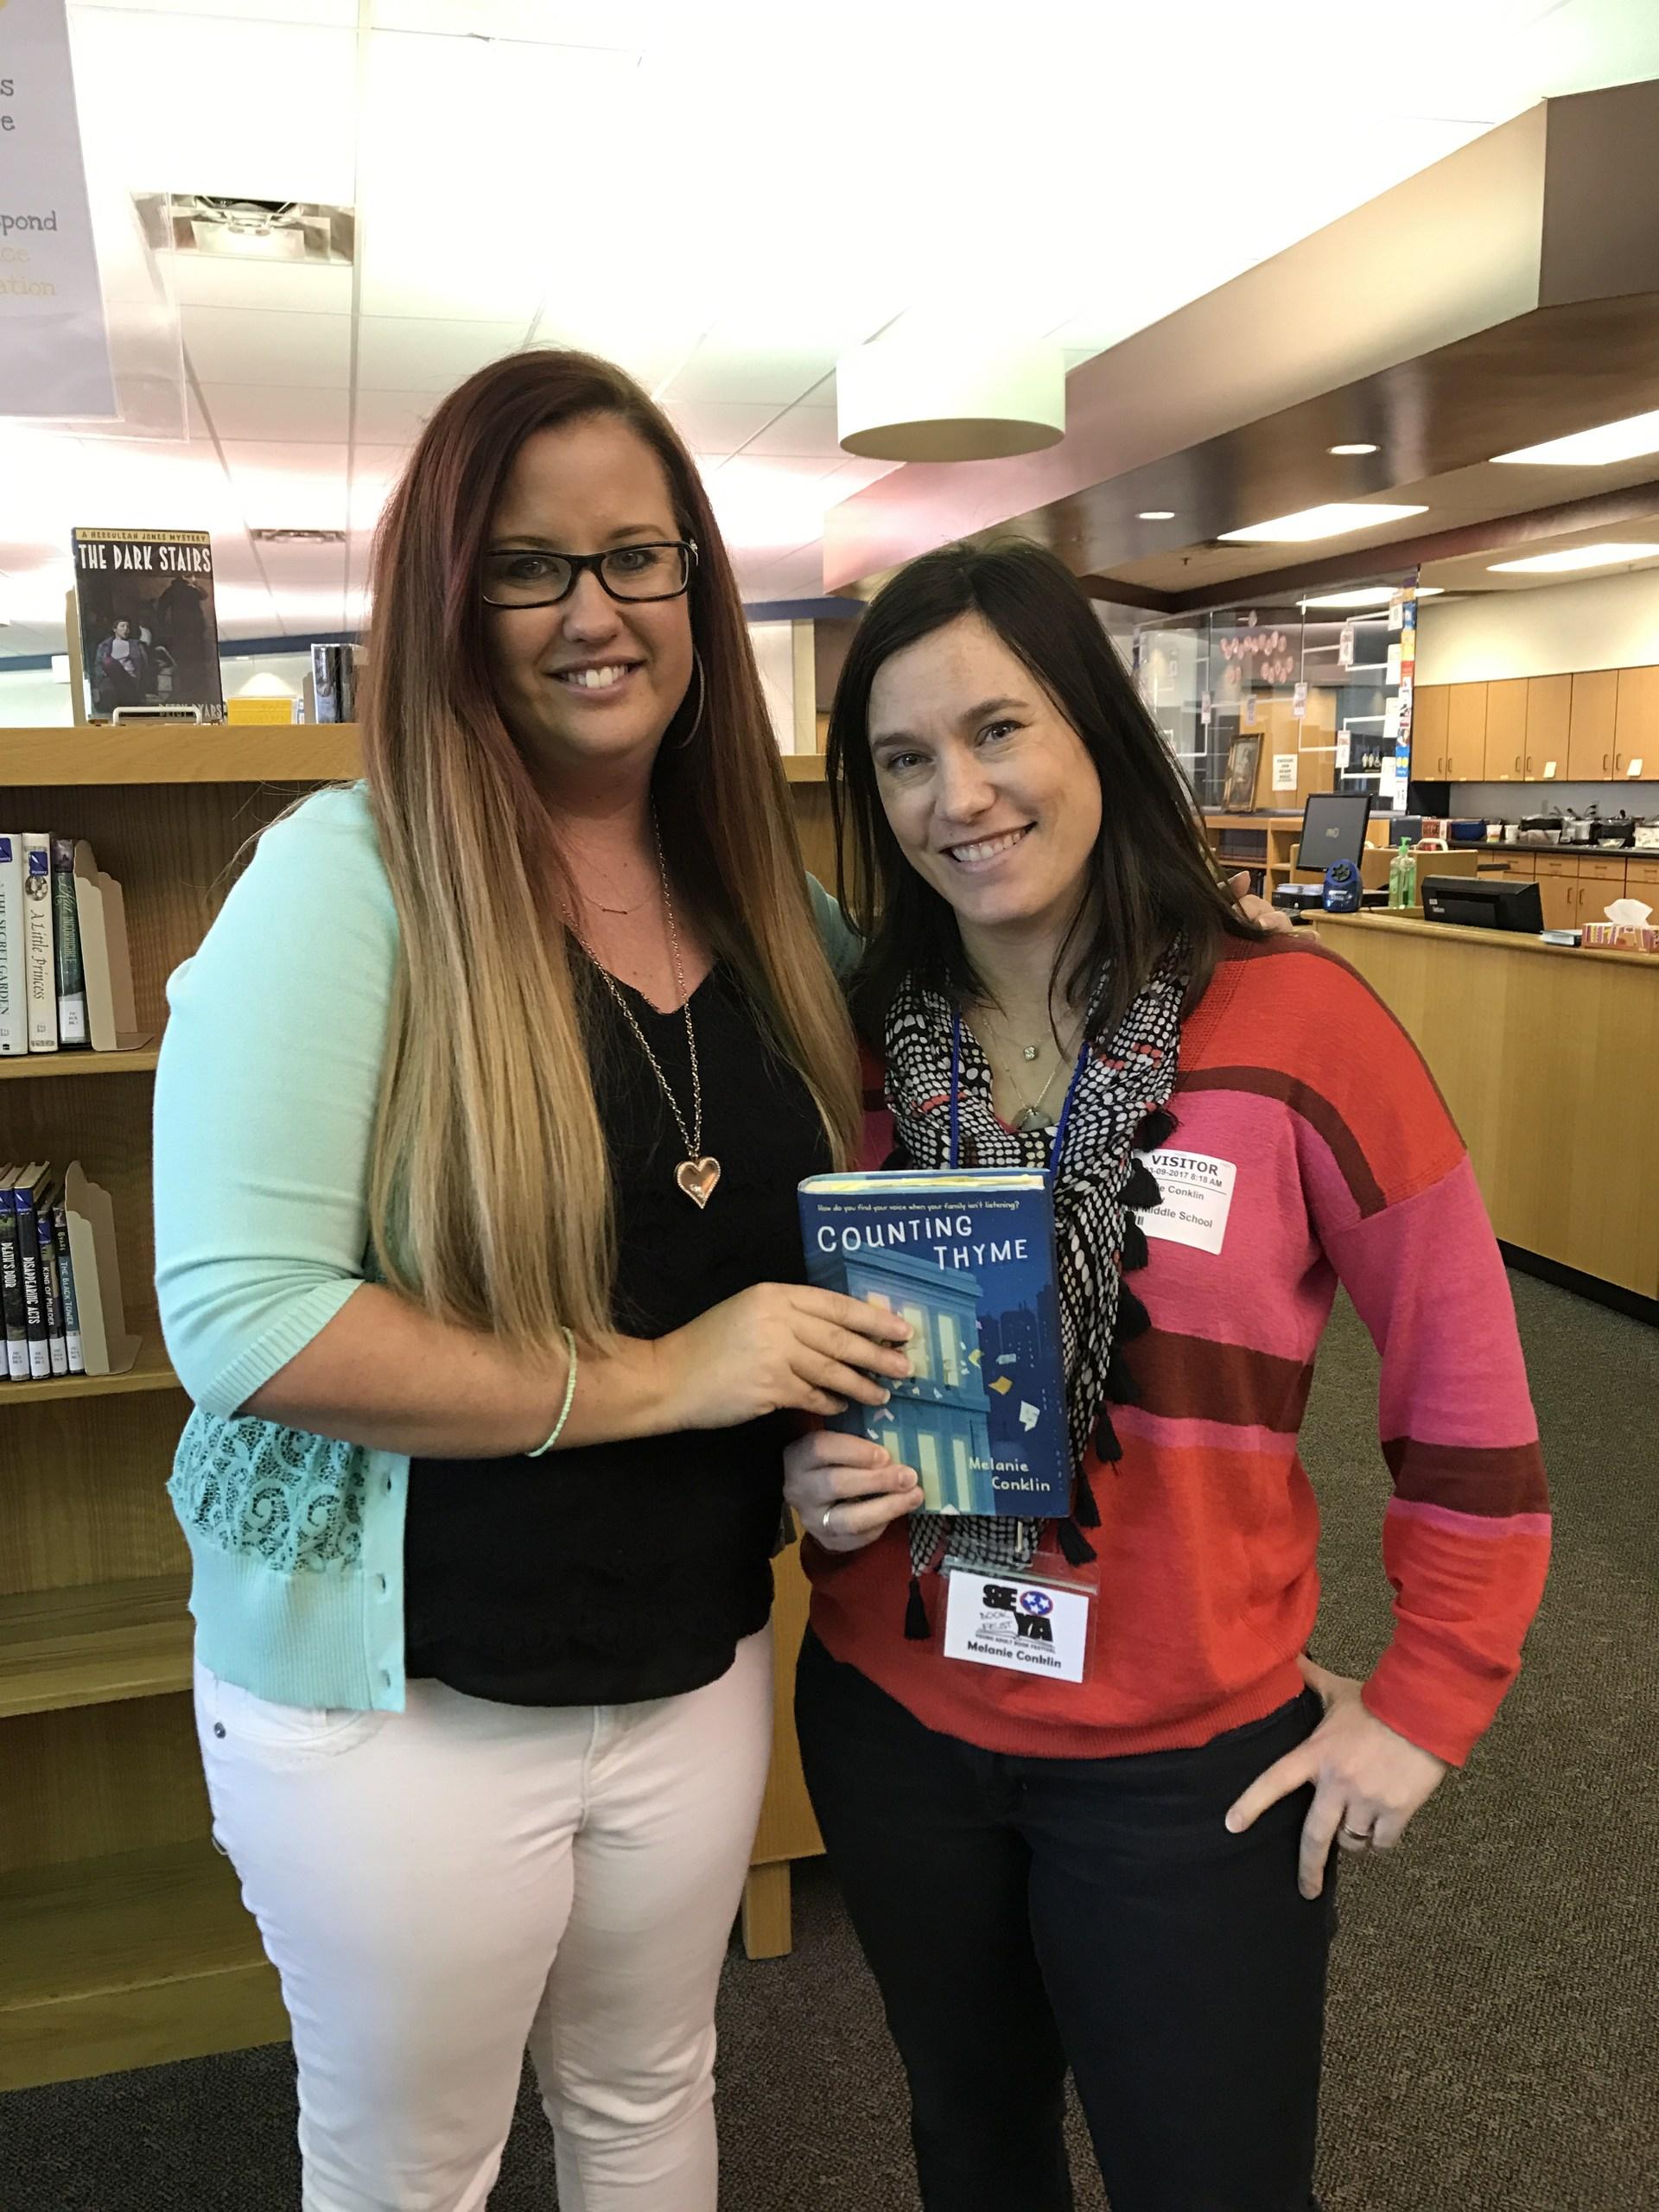 School SEYA author visit with Melanie Conklin